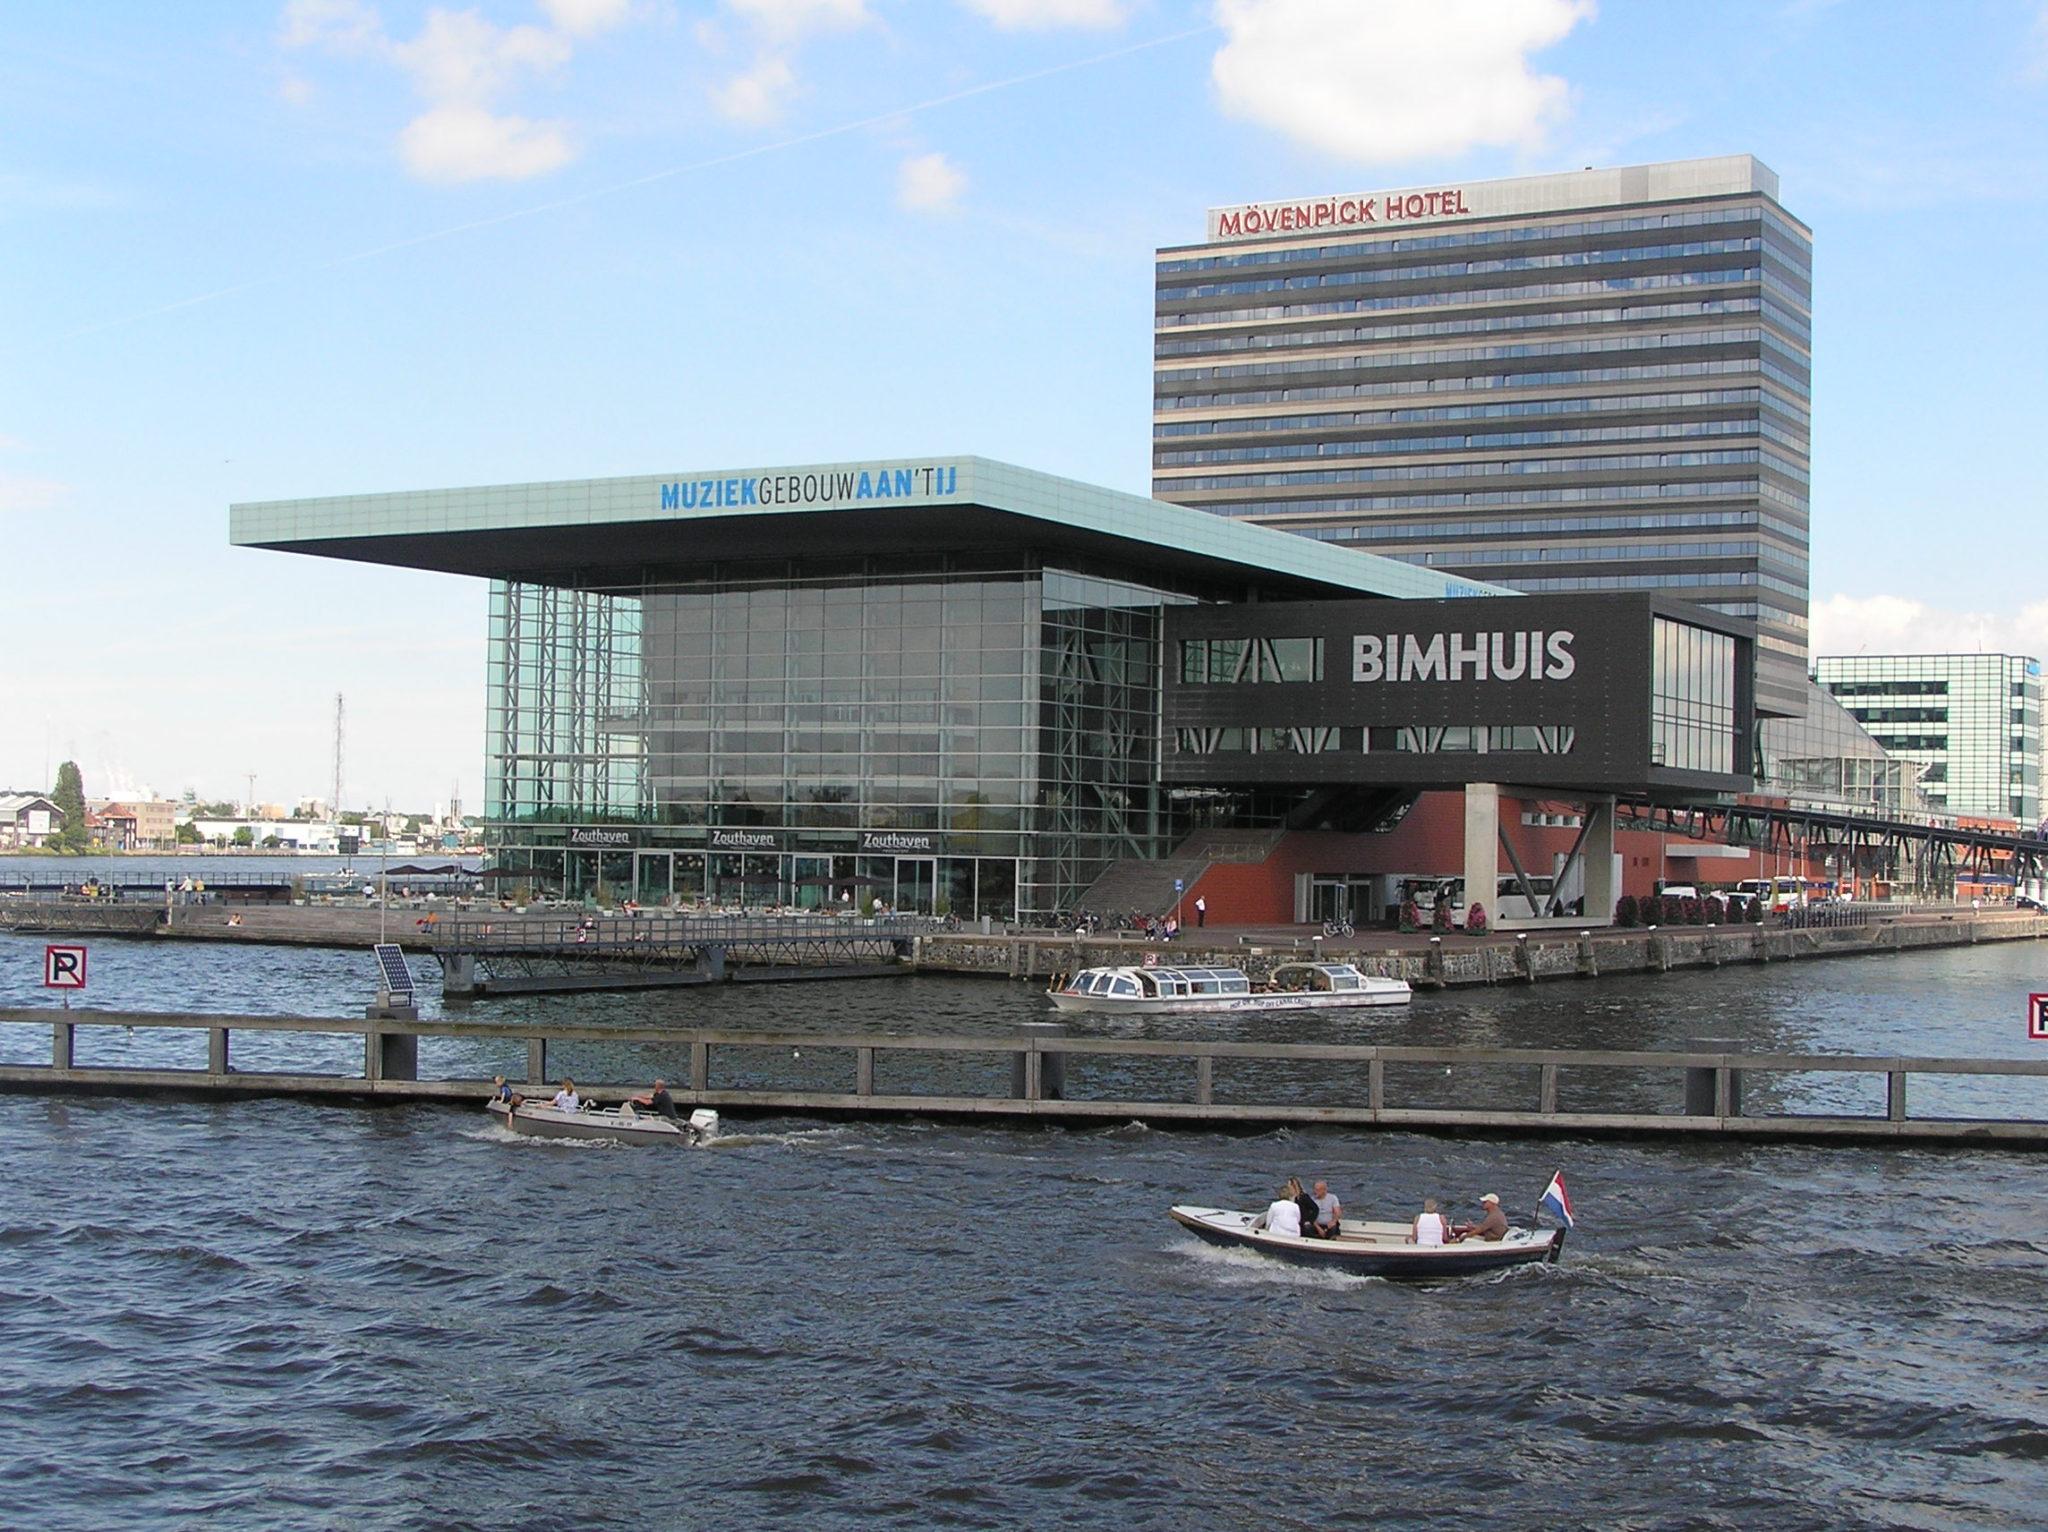 <h6>NL - Amsterdam - Bimhuis